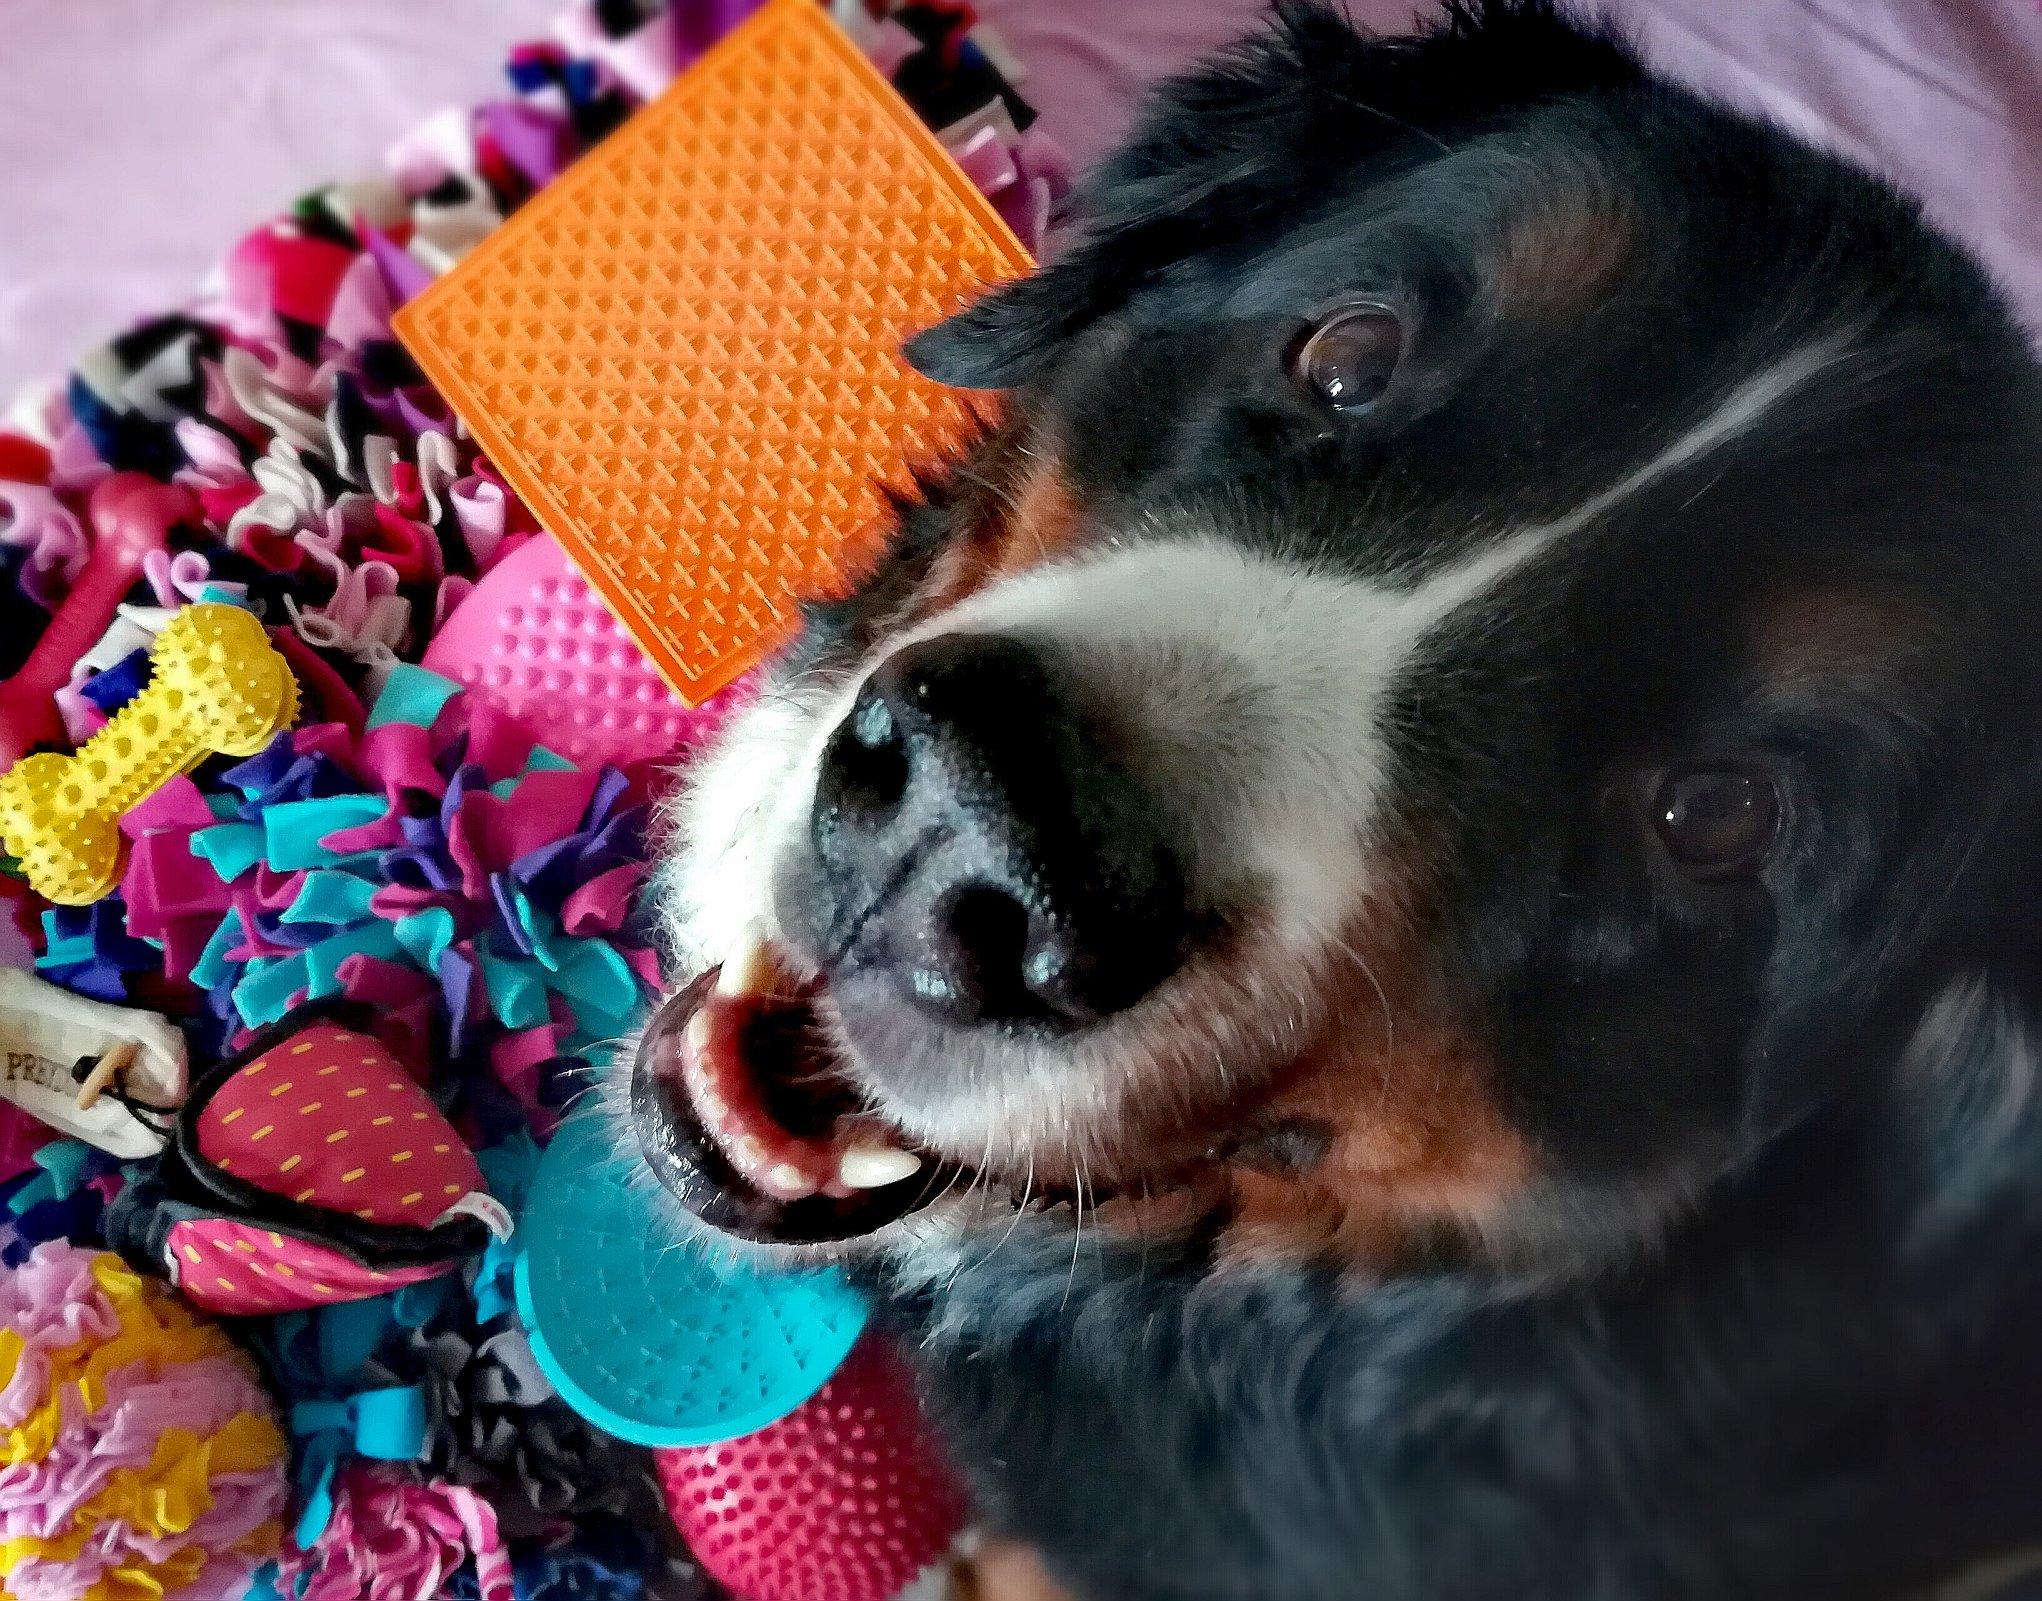 Penny von Hundegspür